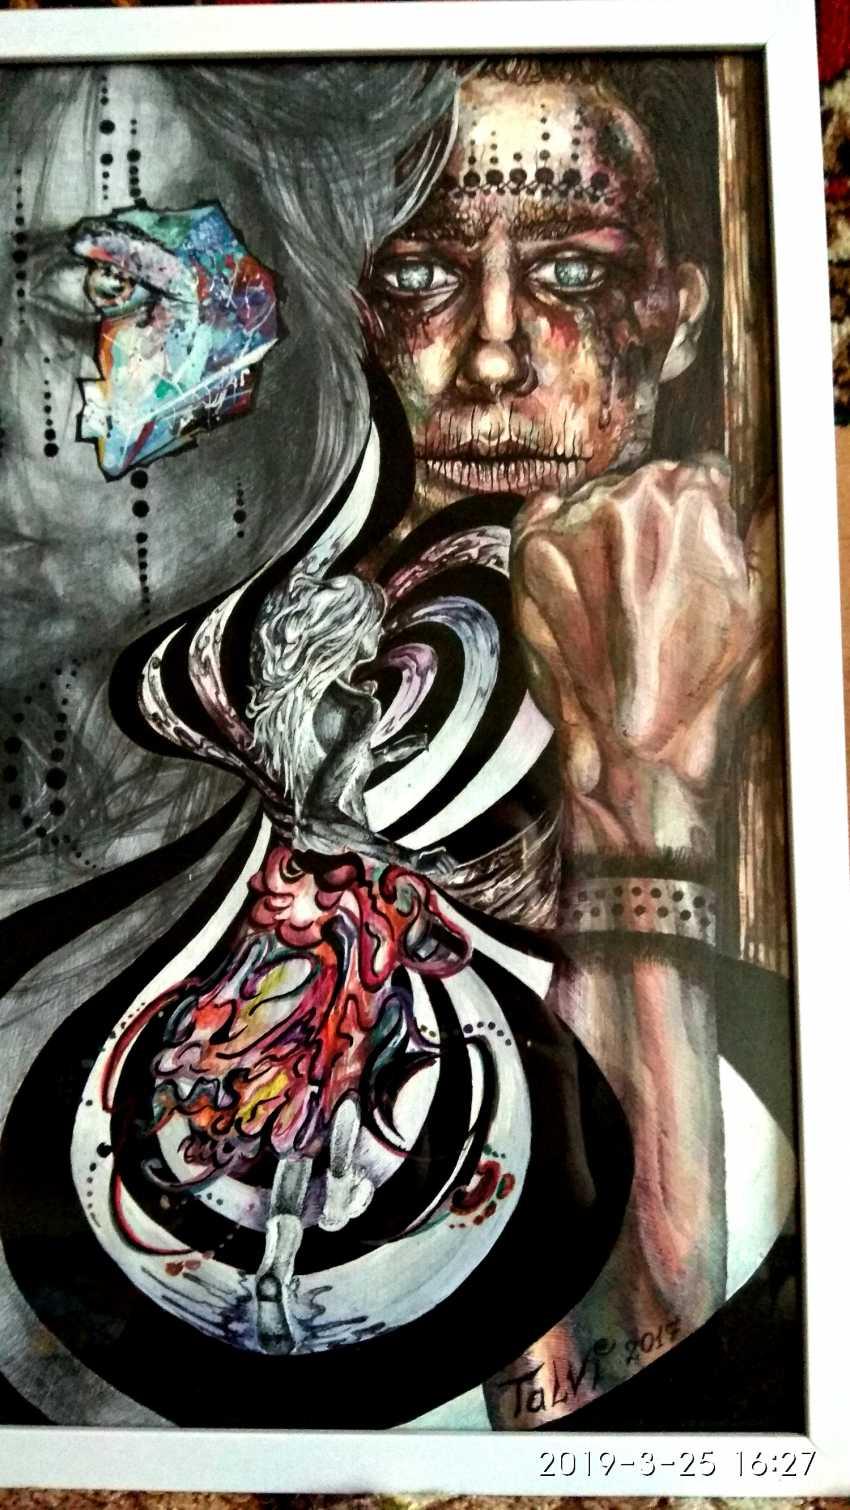 Inga Zagorskaya. Anatomy of the senses - an escape from myself. - photo 3